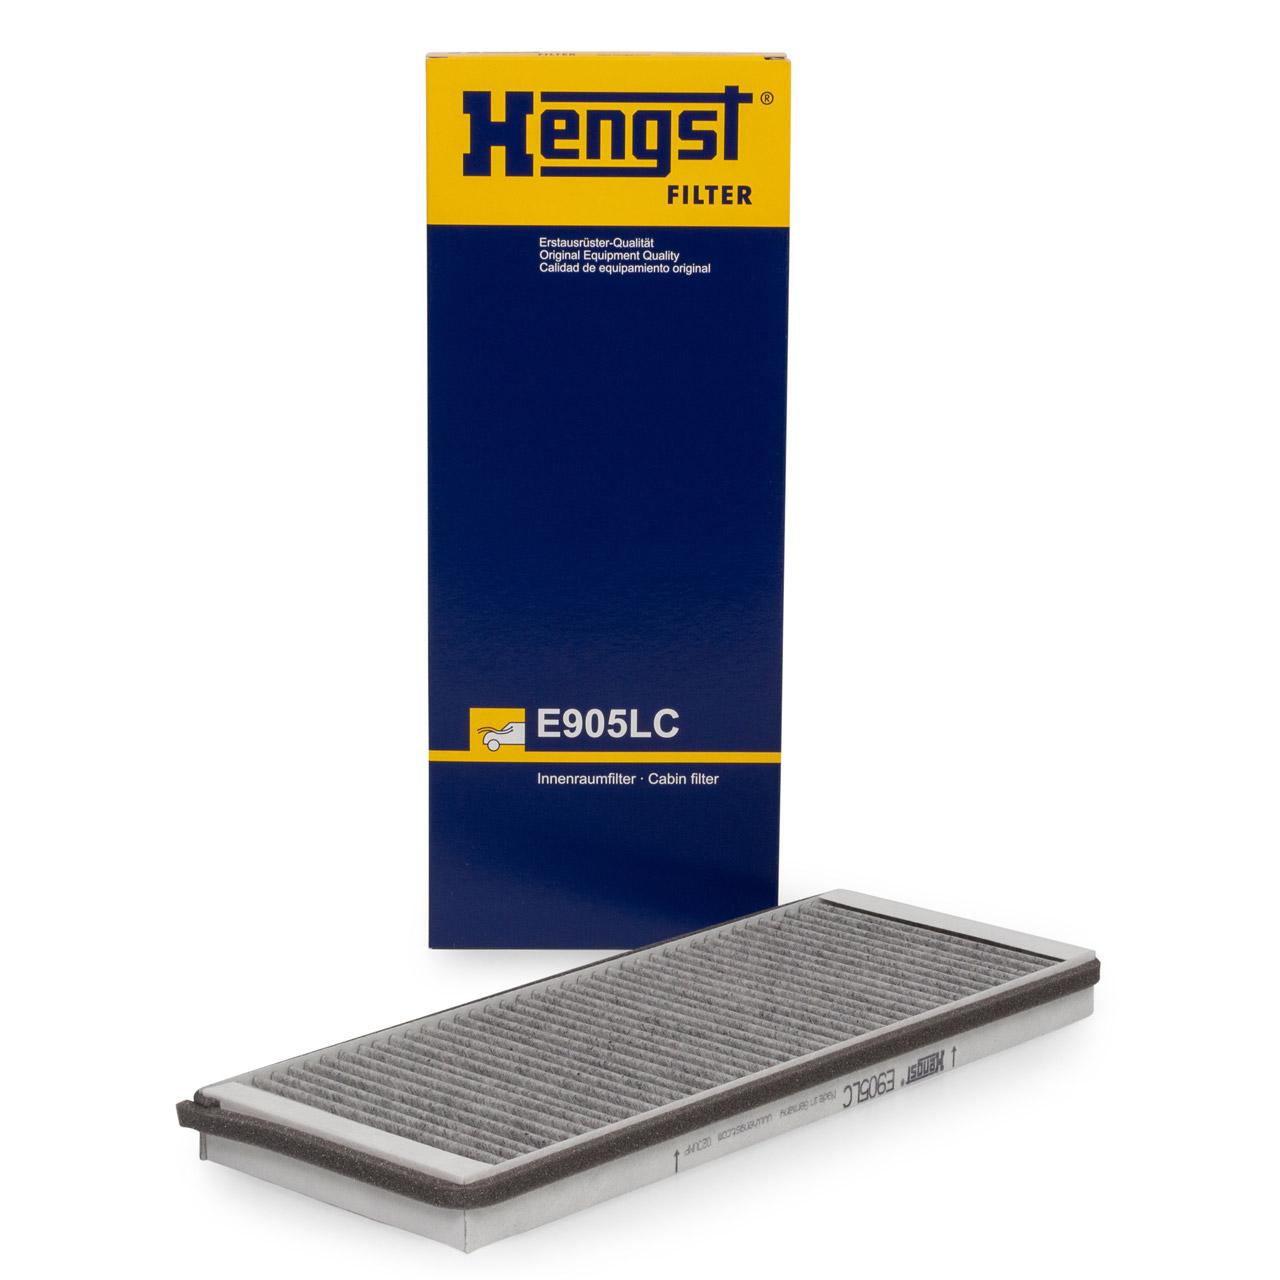 HENGST E905LC Innenraumfilter Aktivkohle für AUDI 80 B4 A4 B5 VW PASSAT 3B2 3B5